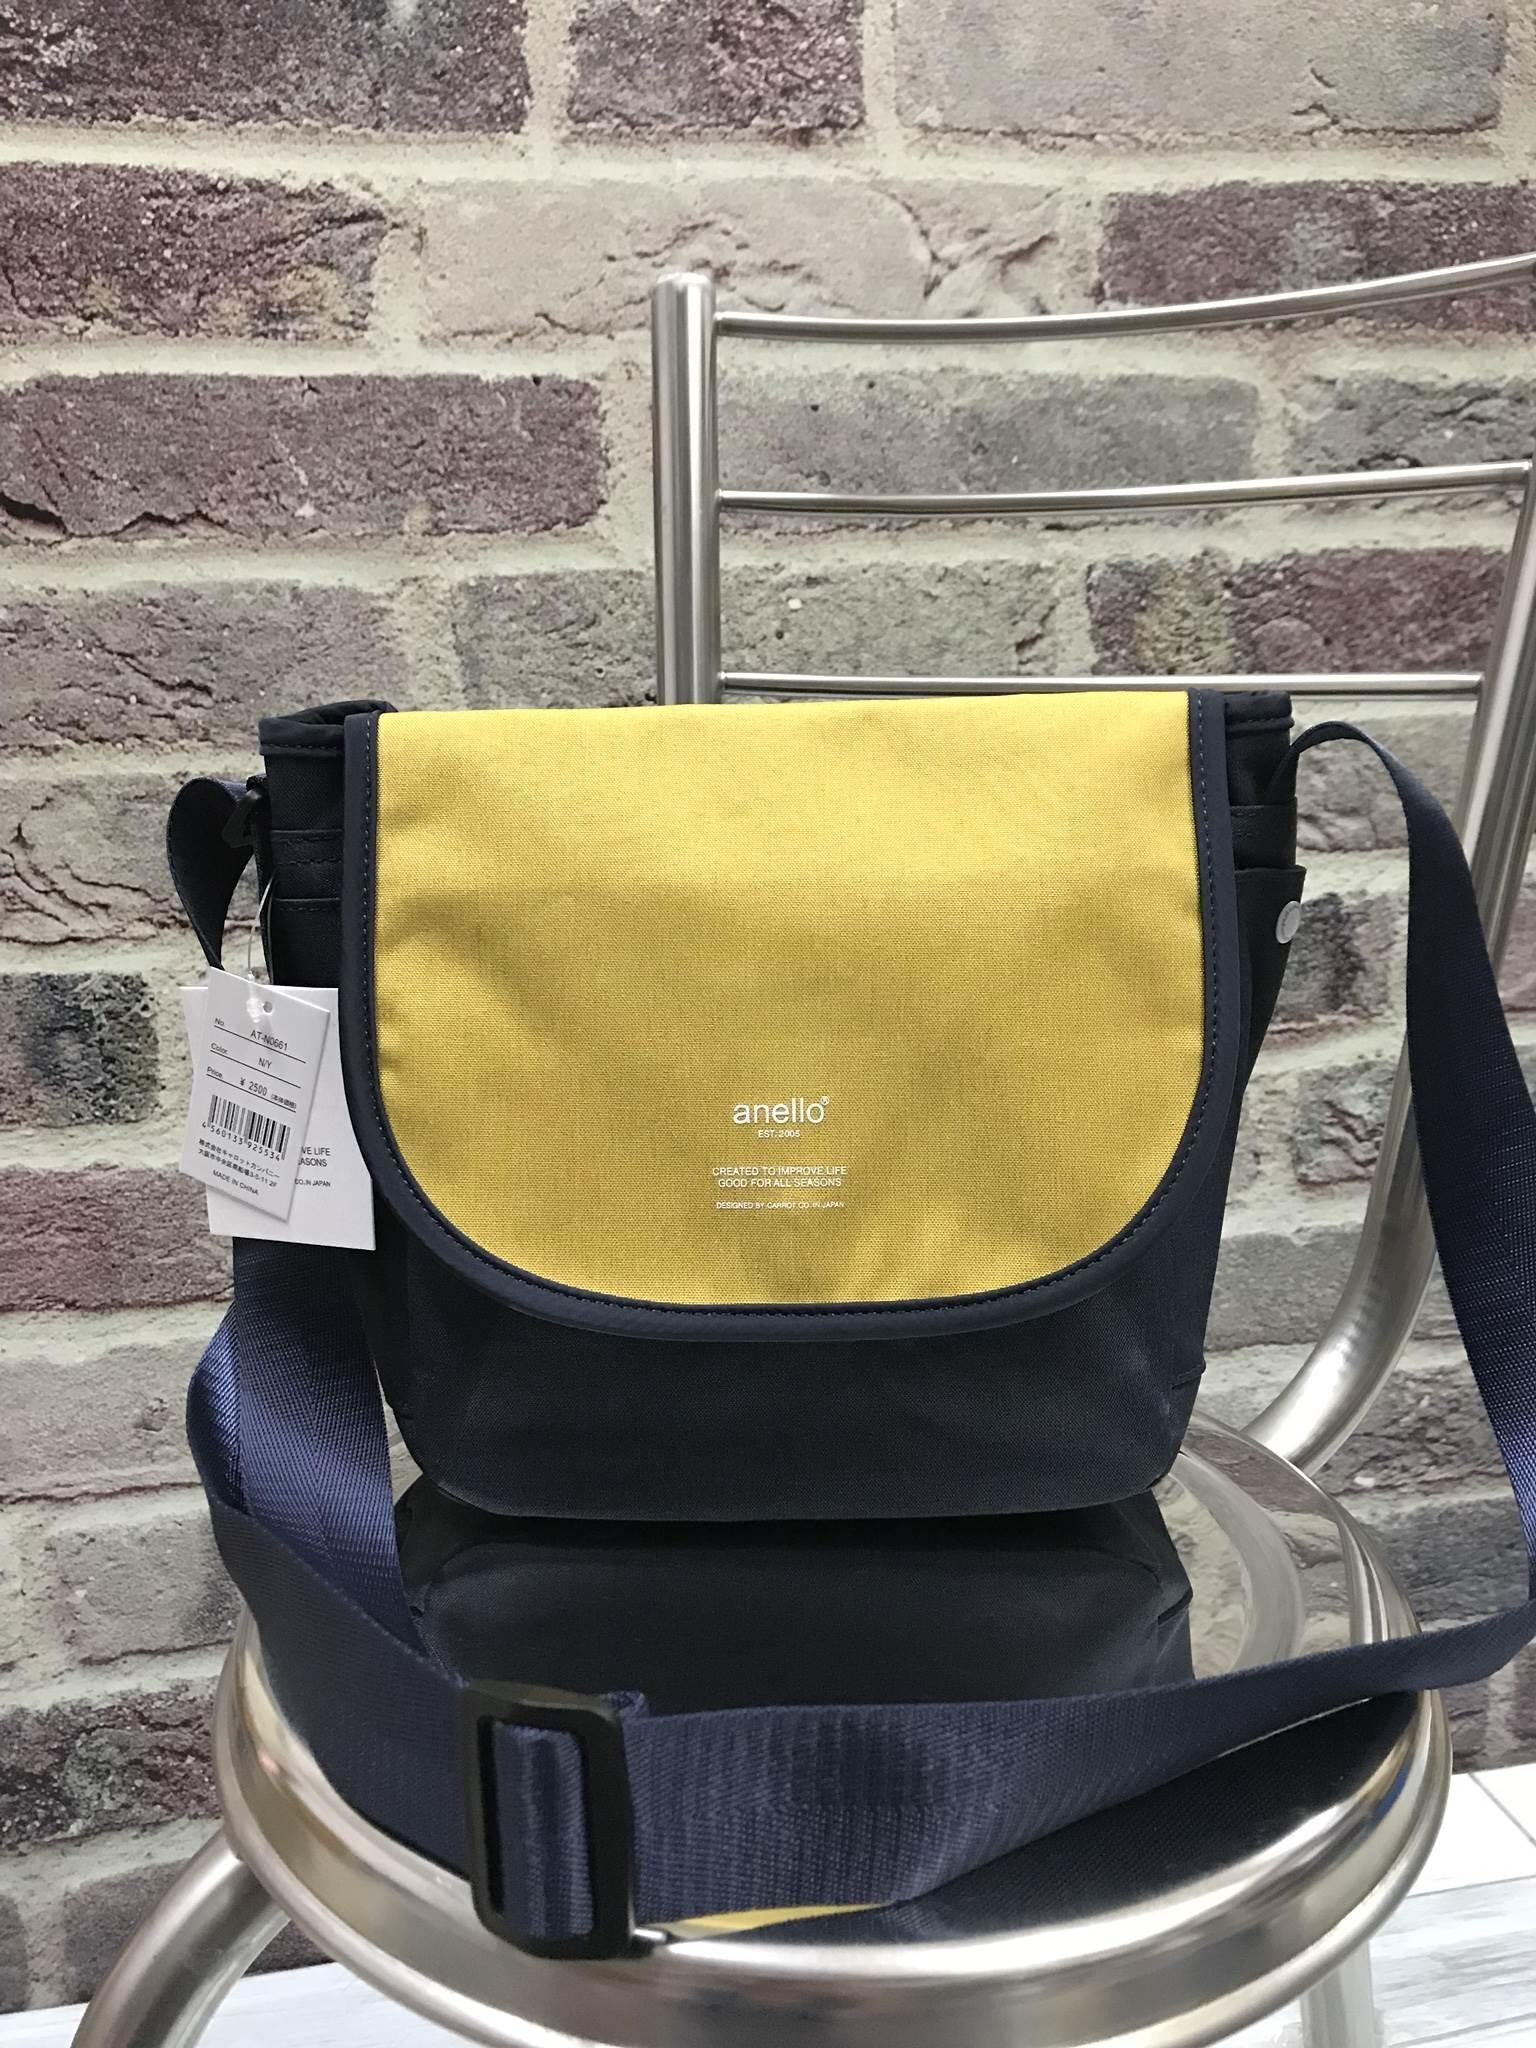 ANELLO MOTTLED FABRIC MINI SHOUDLER BAG WITH FLAP *เหลืองกรม